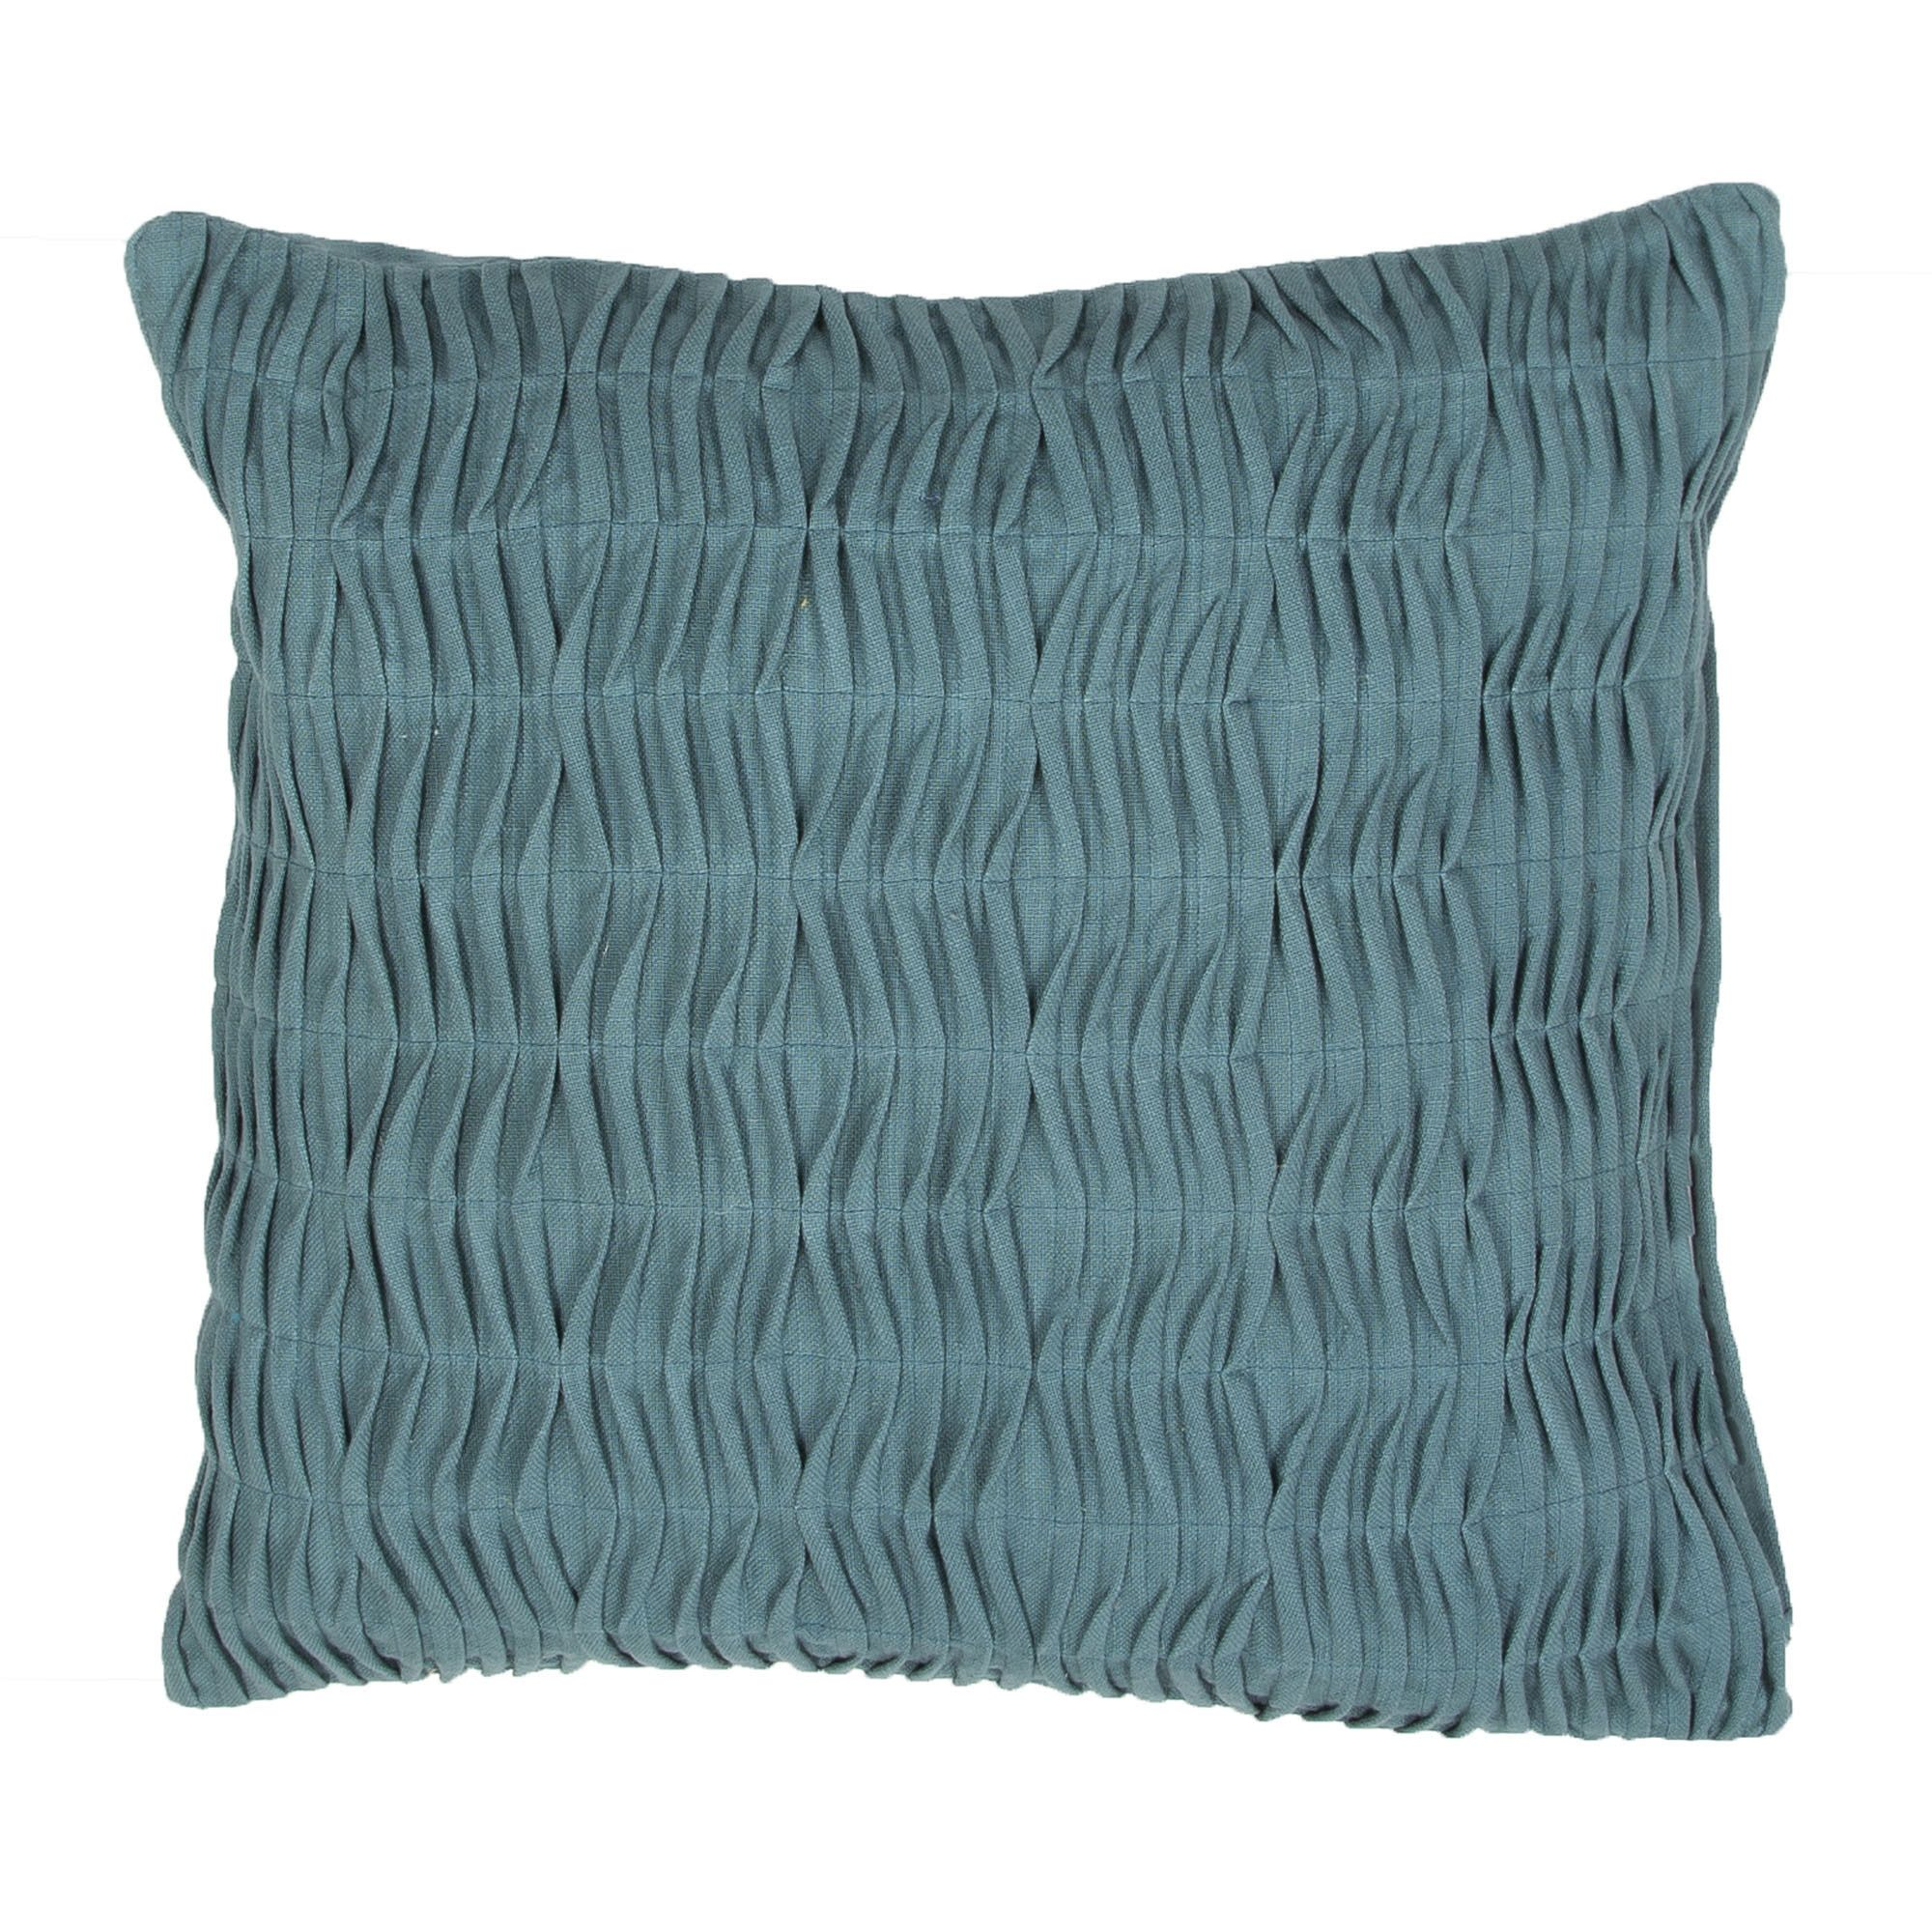 Jaipur Living Handmade 20-inch Solid Throw Pillow